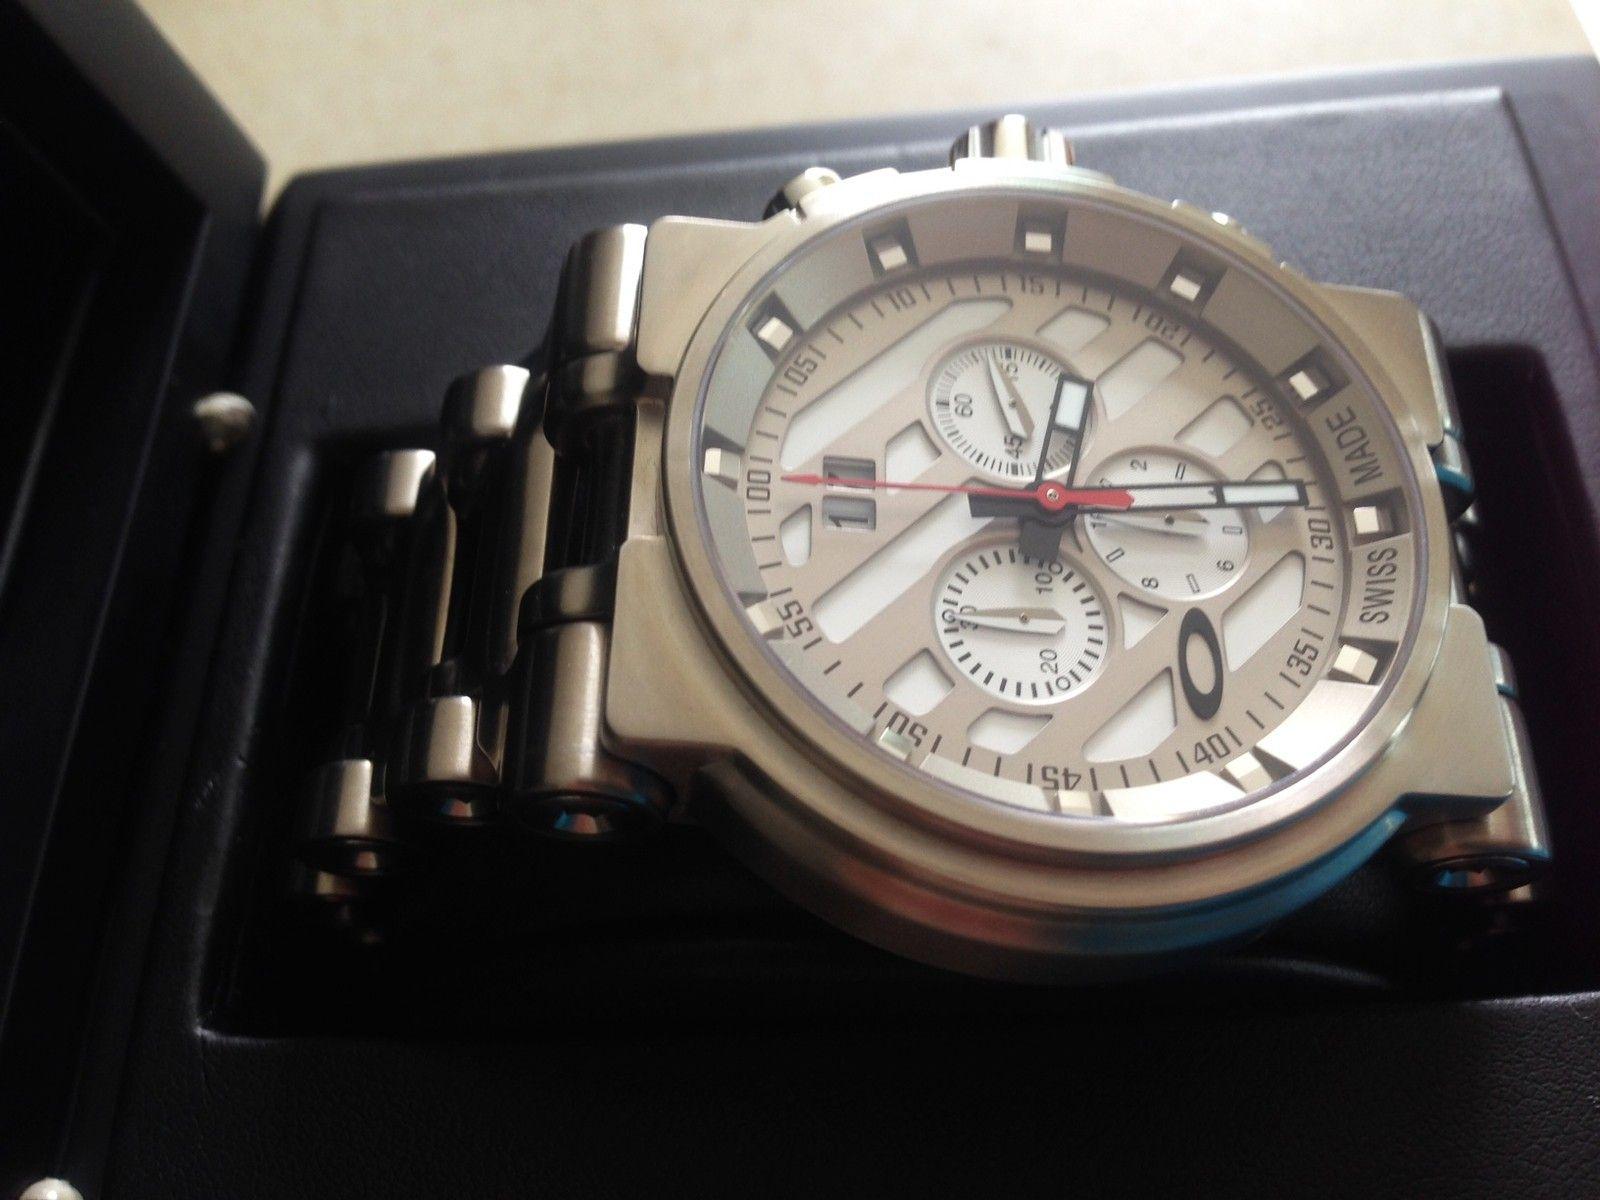 NEW IN BOX Oakley Hollow Point Titanium Watch White Dial 10-046 - 8.JPG